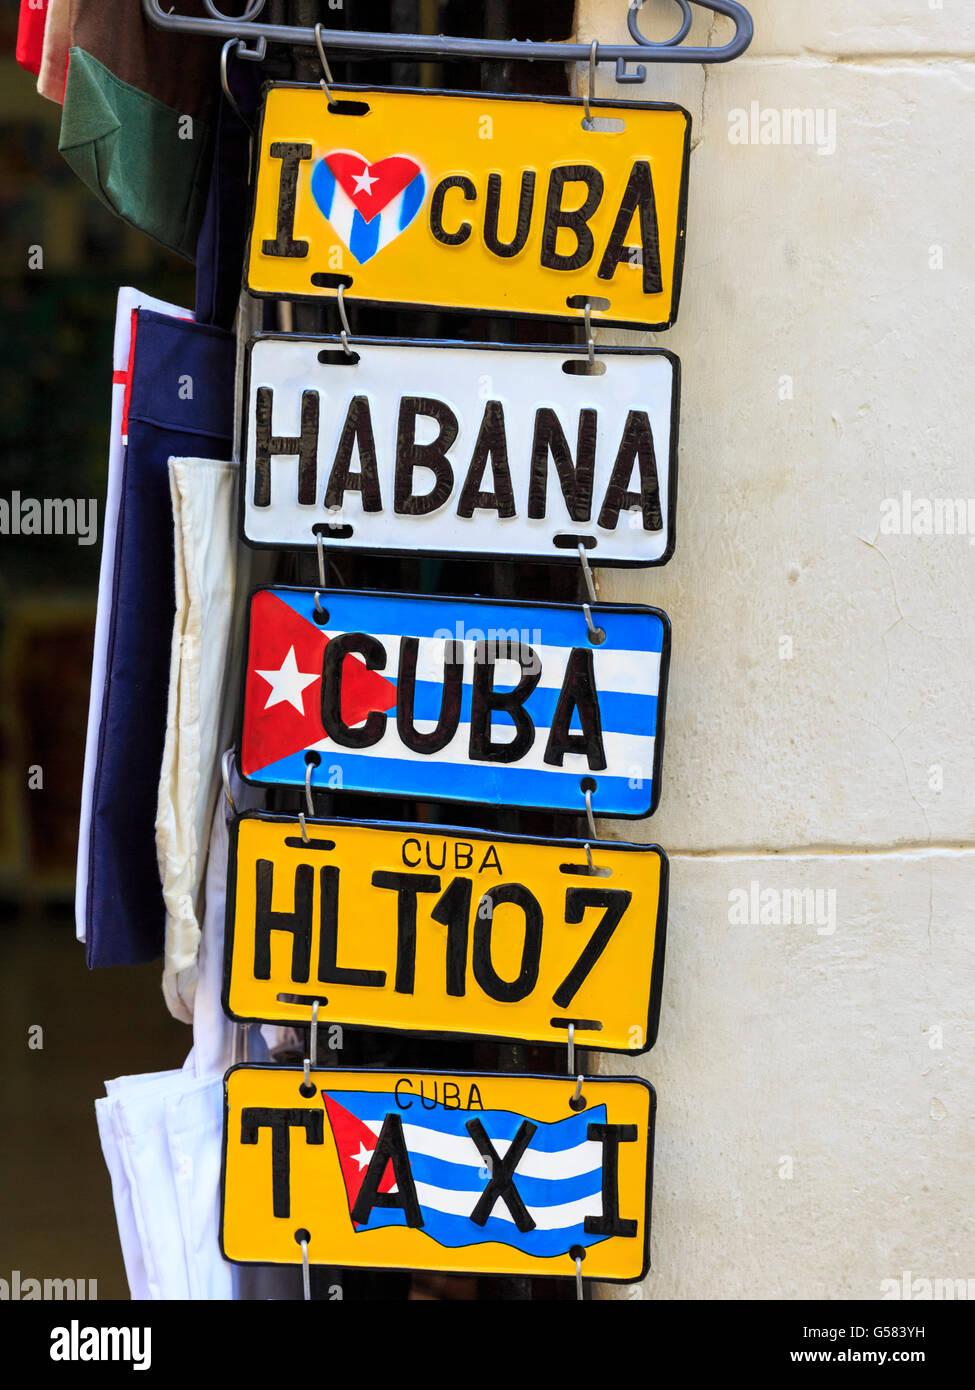 Souvenir gift car registration number plates in a shop in Havana, Cuba - Stock Image